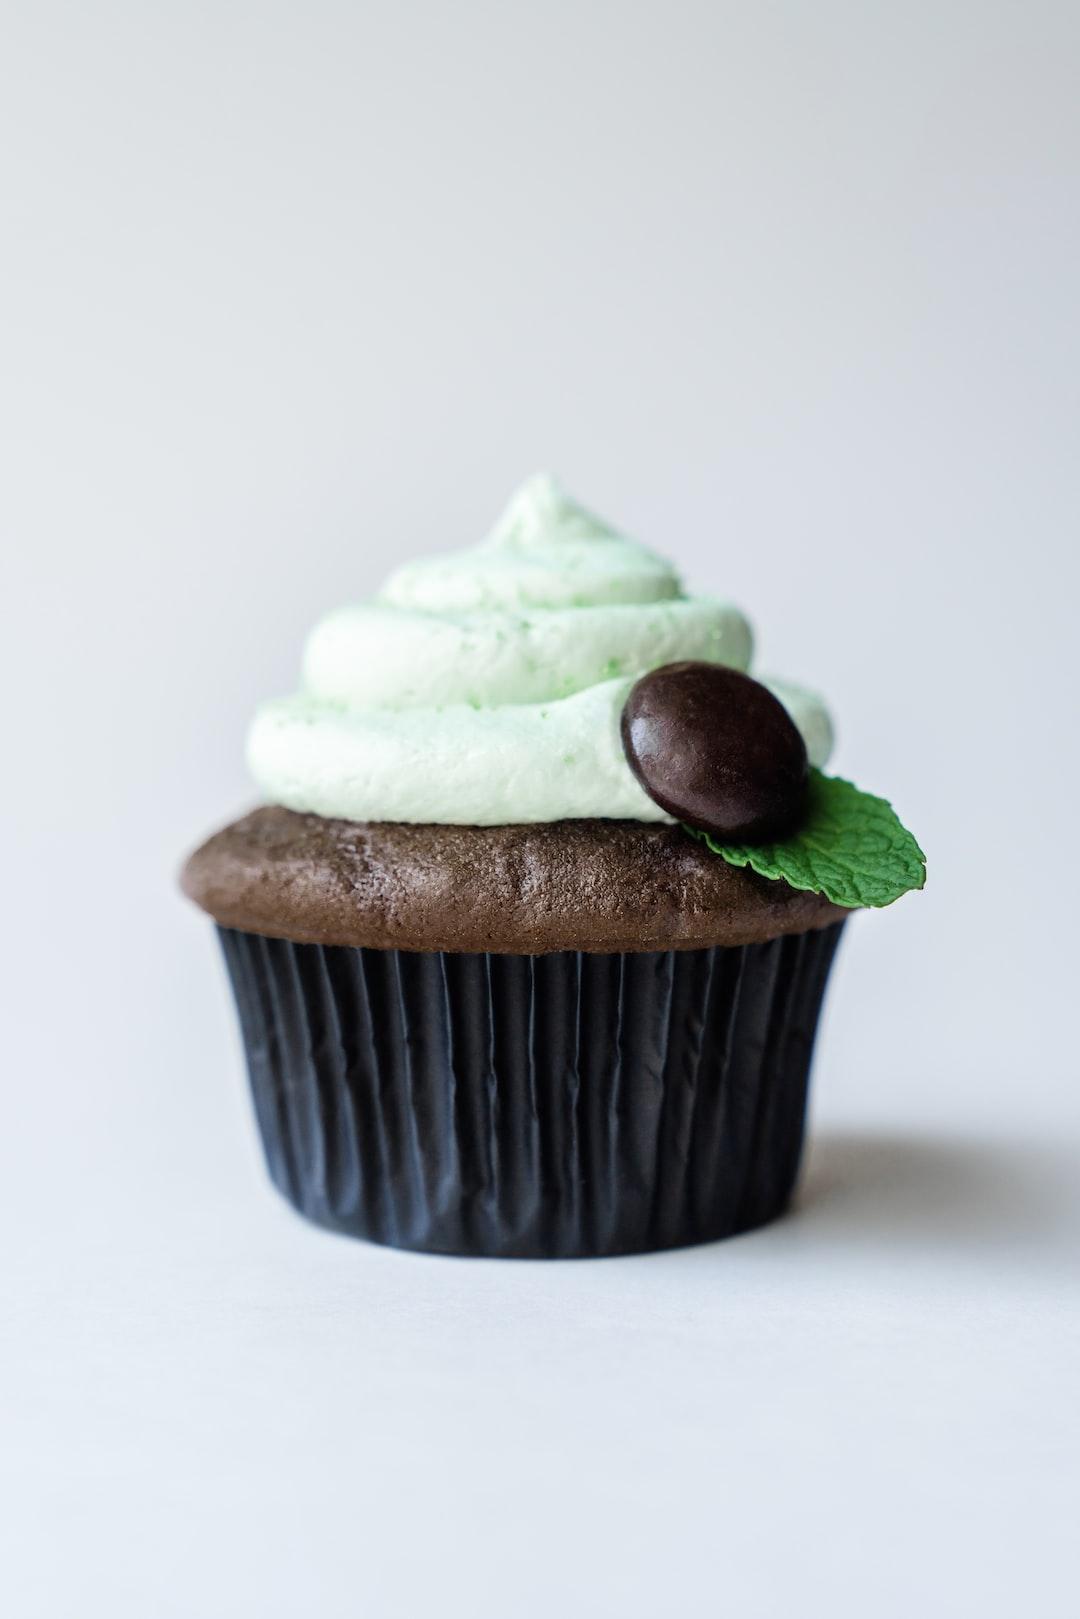 Junior Mints® cupcake.